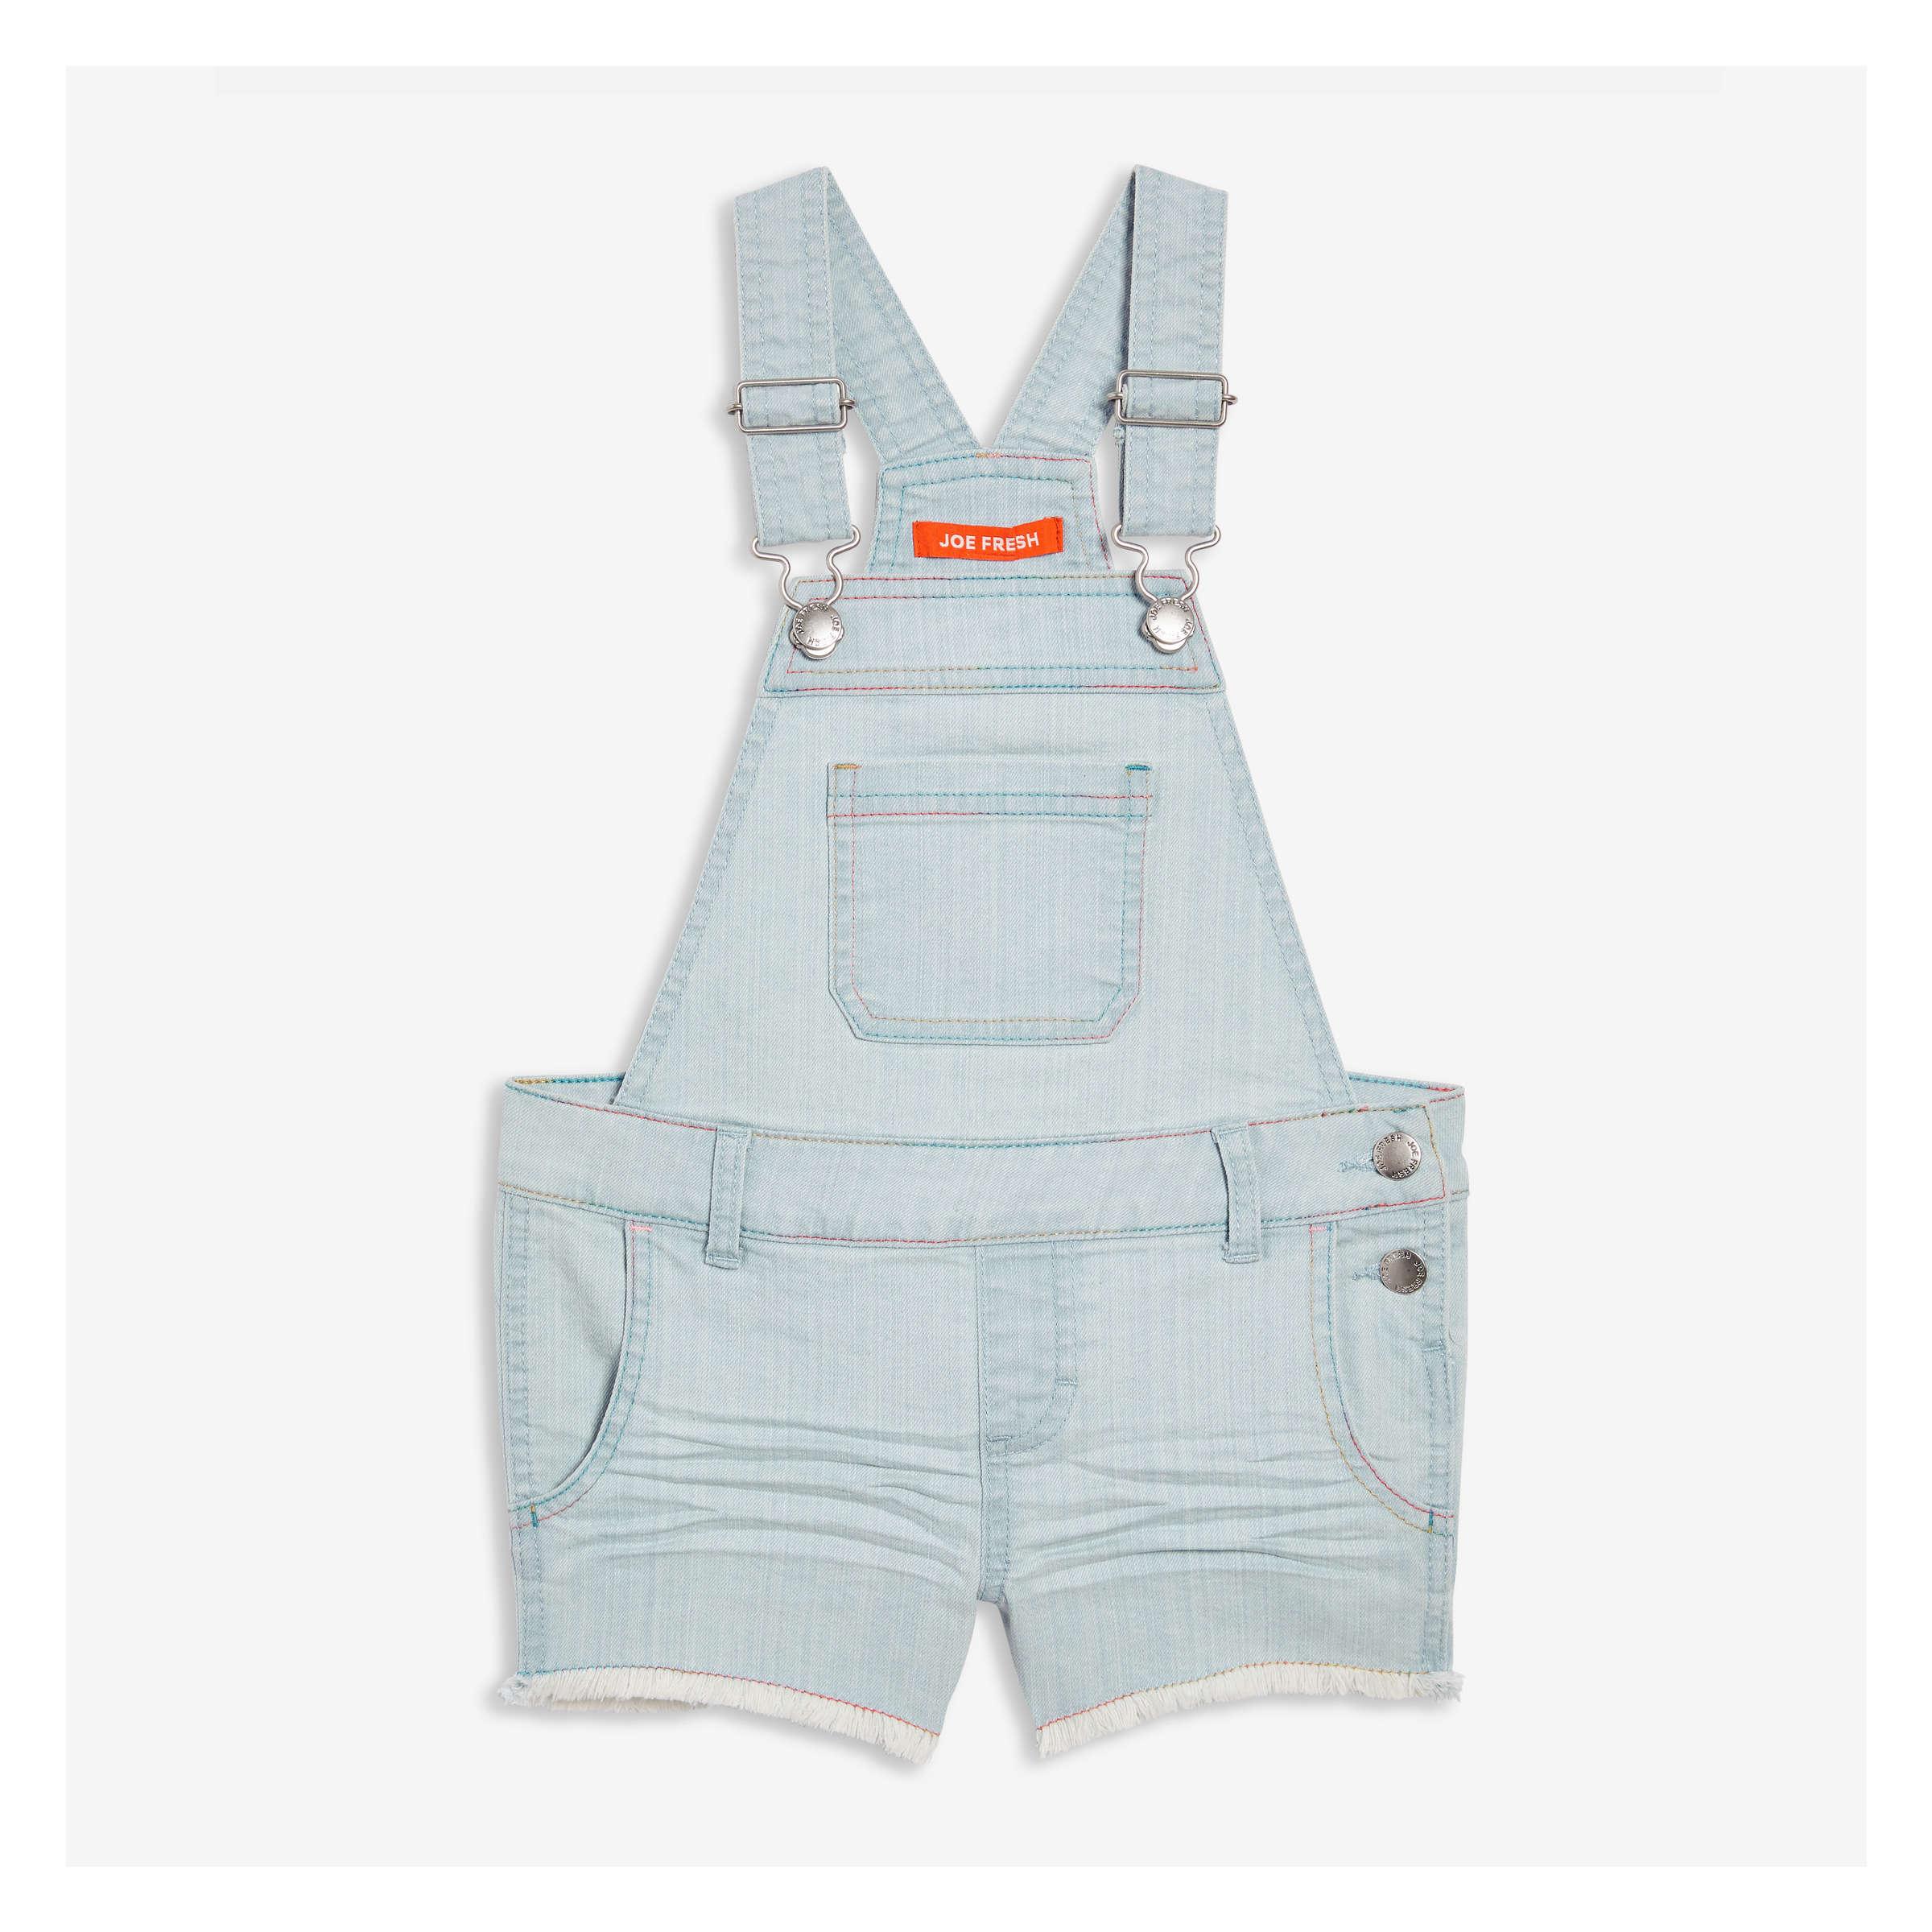 2e8509a78332 Kid Girls' Denim Overalls in Light Wash from Joe Fresh